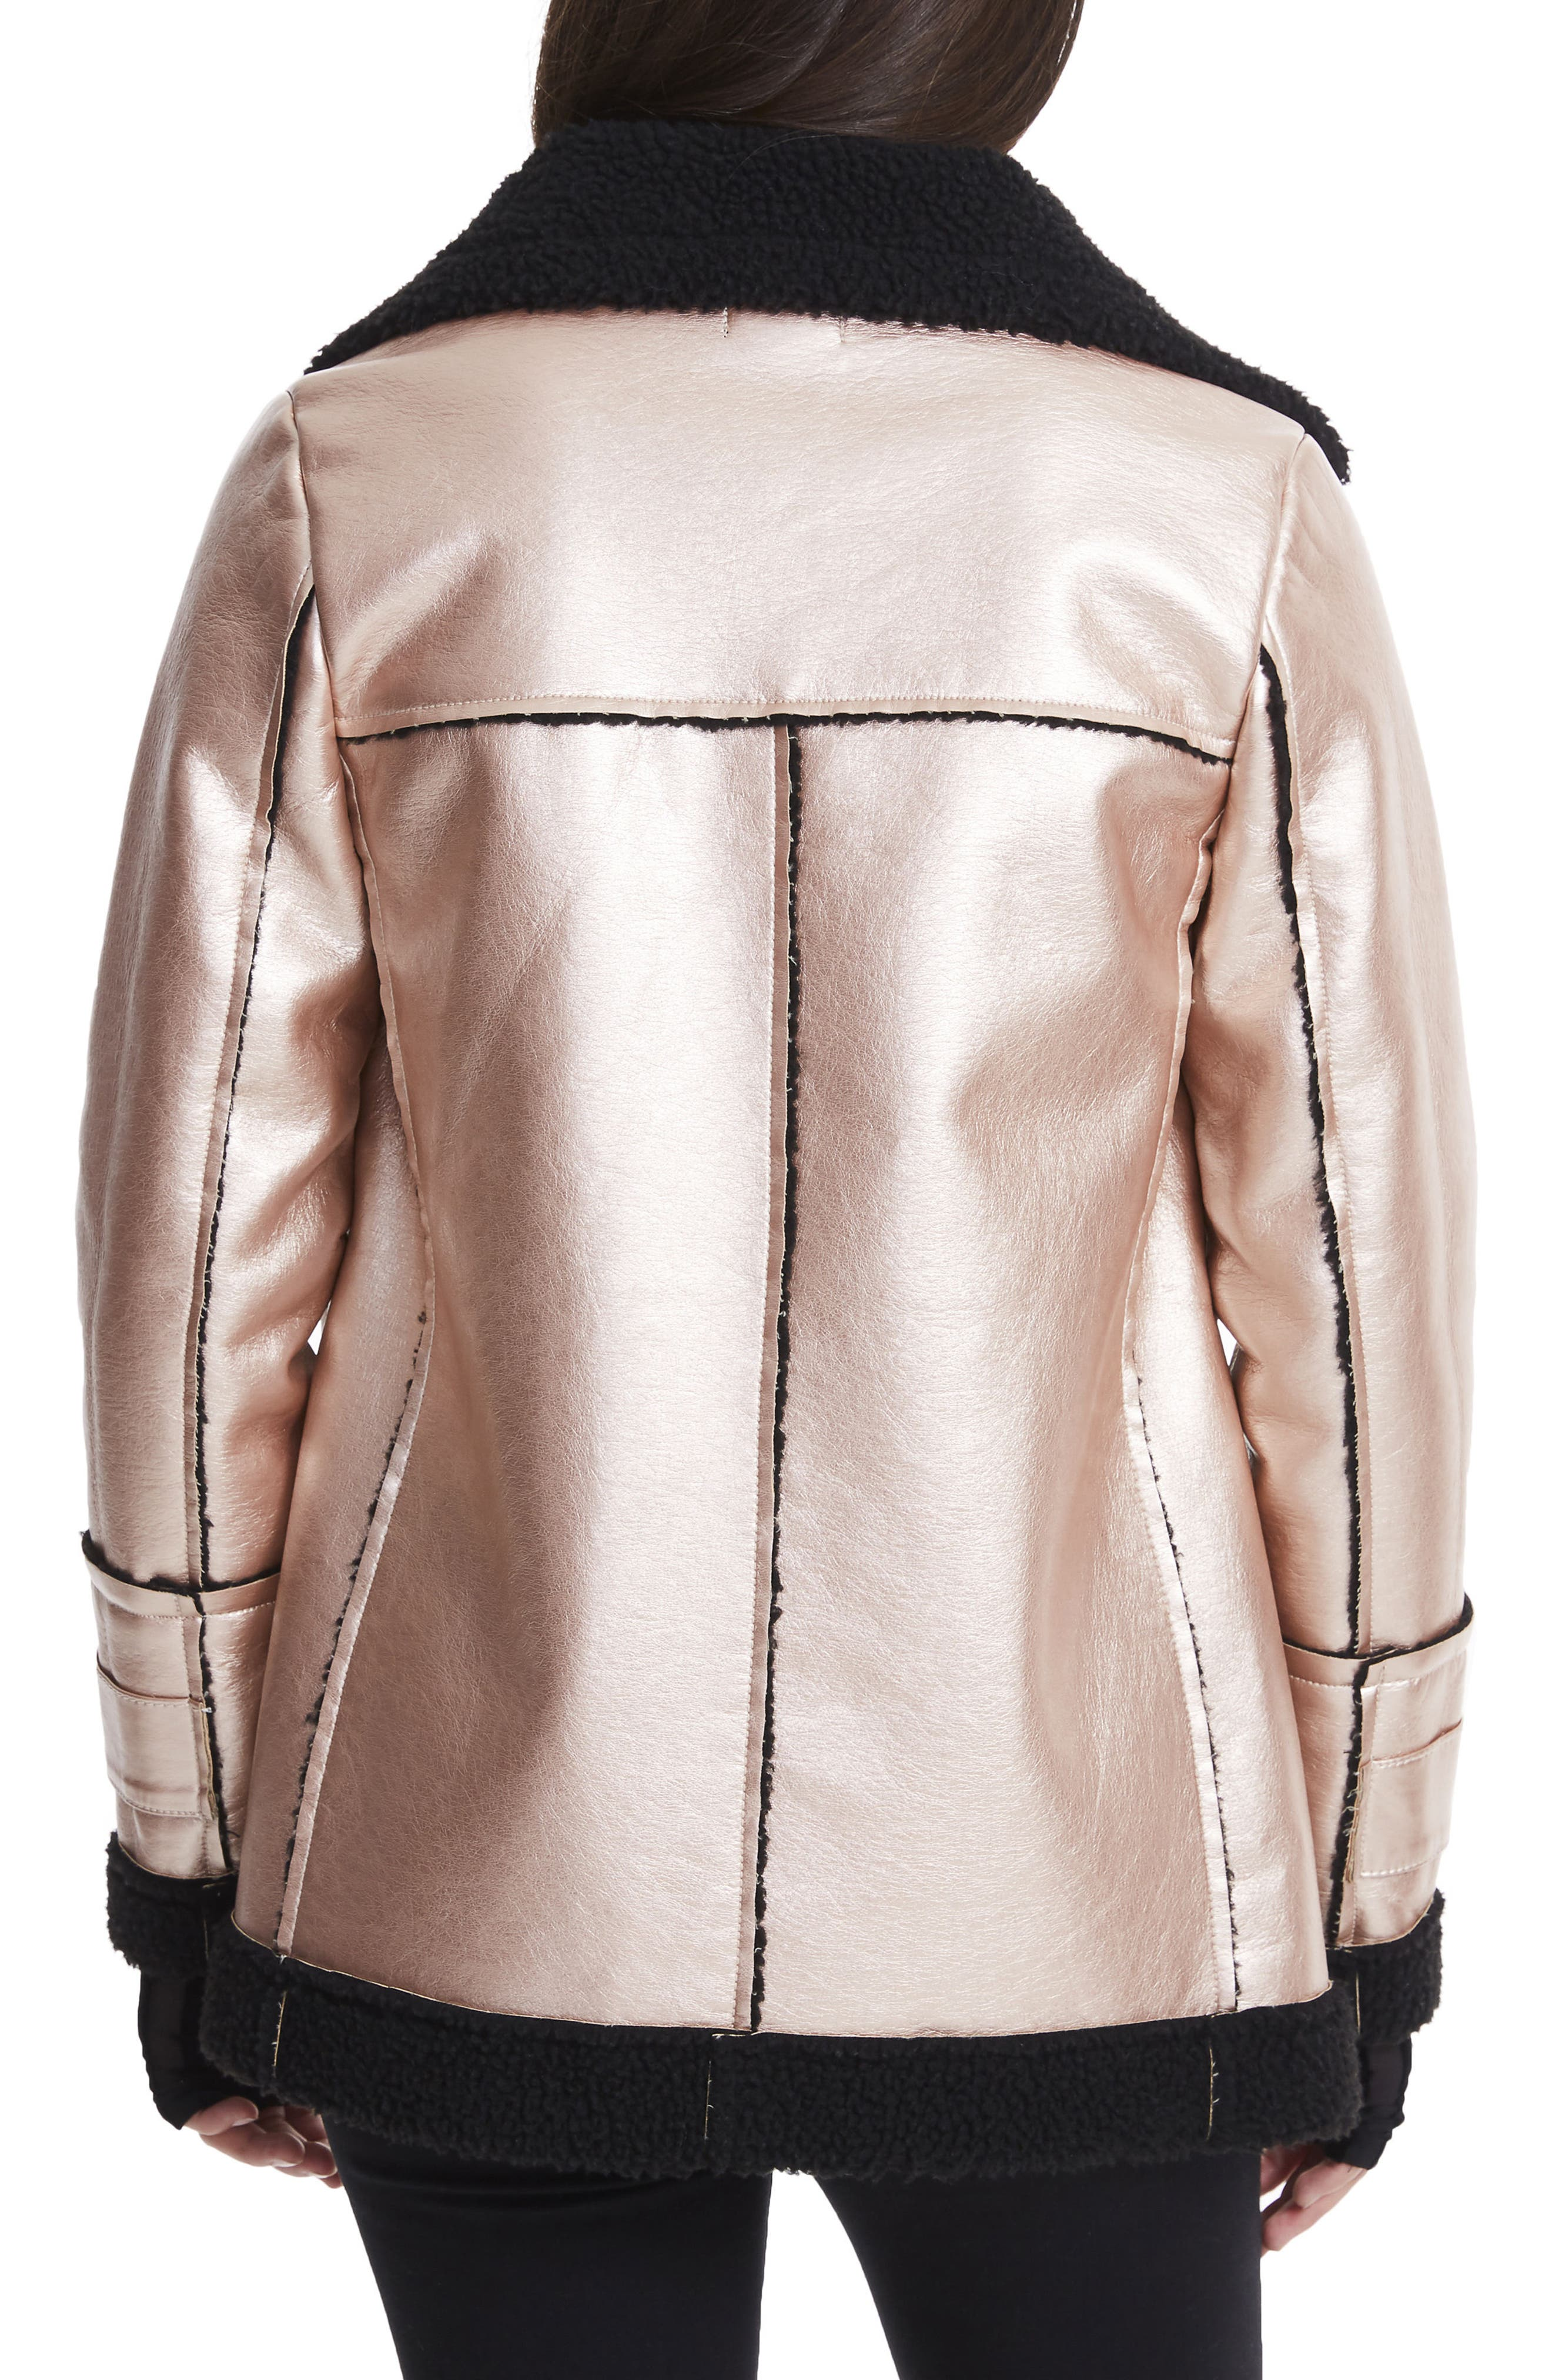 Ophelia Oversize Faux Shearling Jacket,                             Alternate thumbnail 2, color,                             Metallic